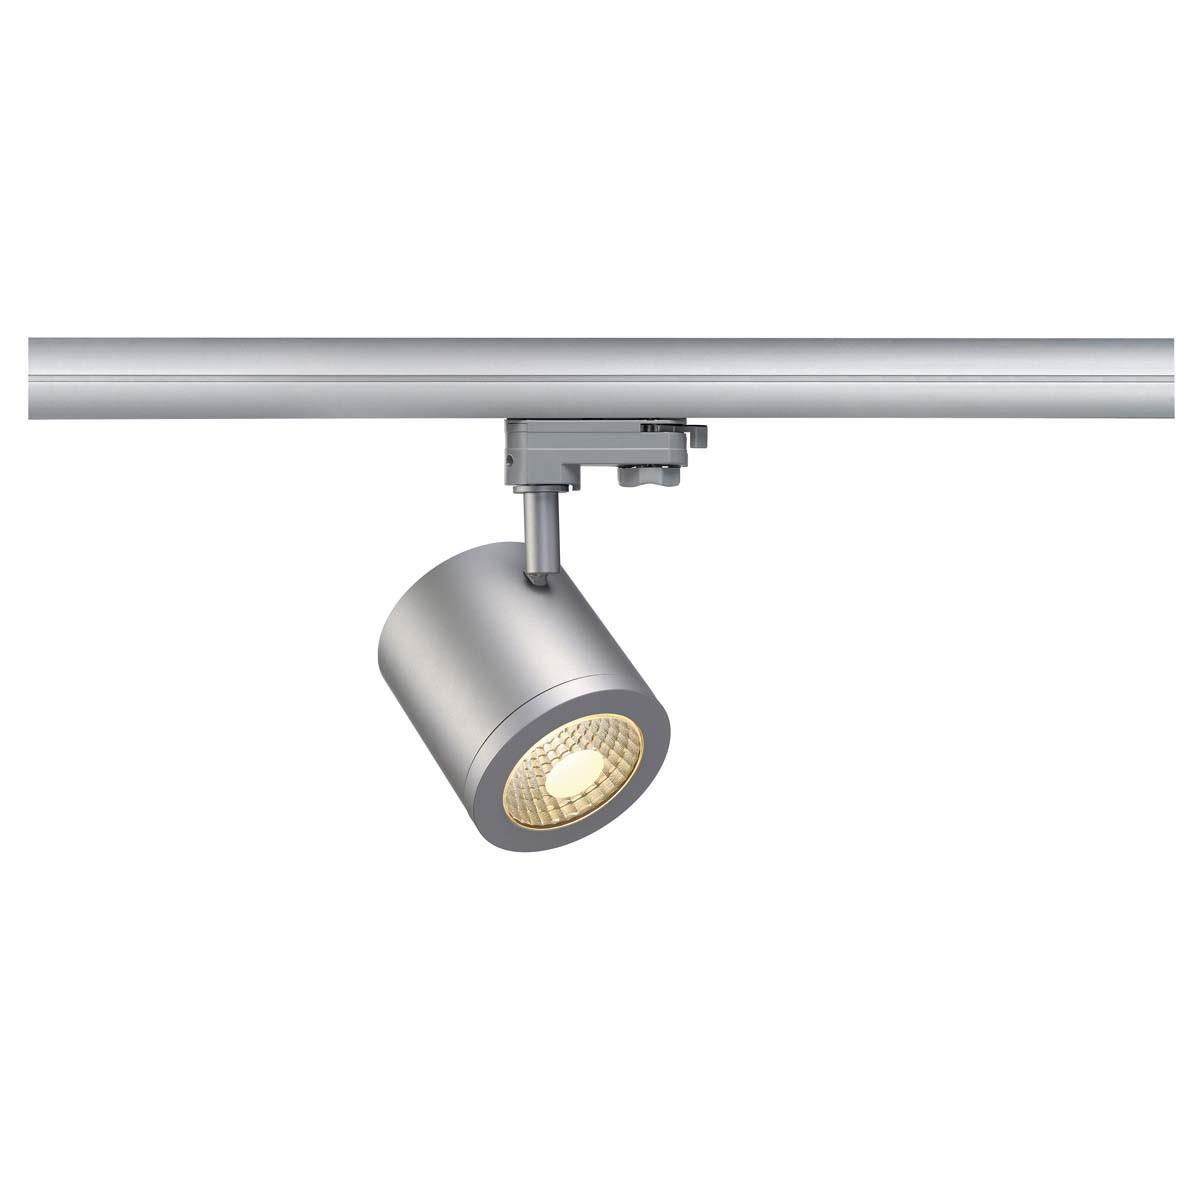 SLV 152424 Enola C9 LED 9W 3000K 35 Degree Silver Grey Eutrac 3 Circuit 240V Track Light